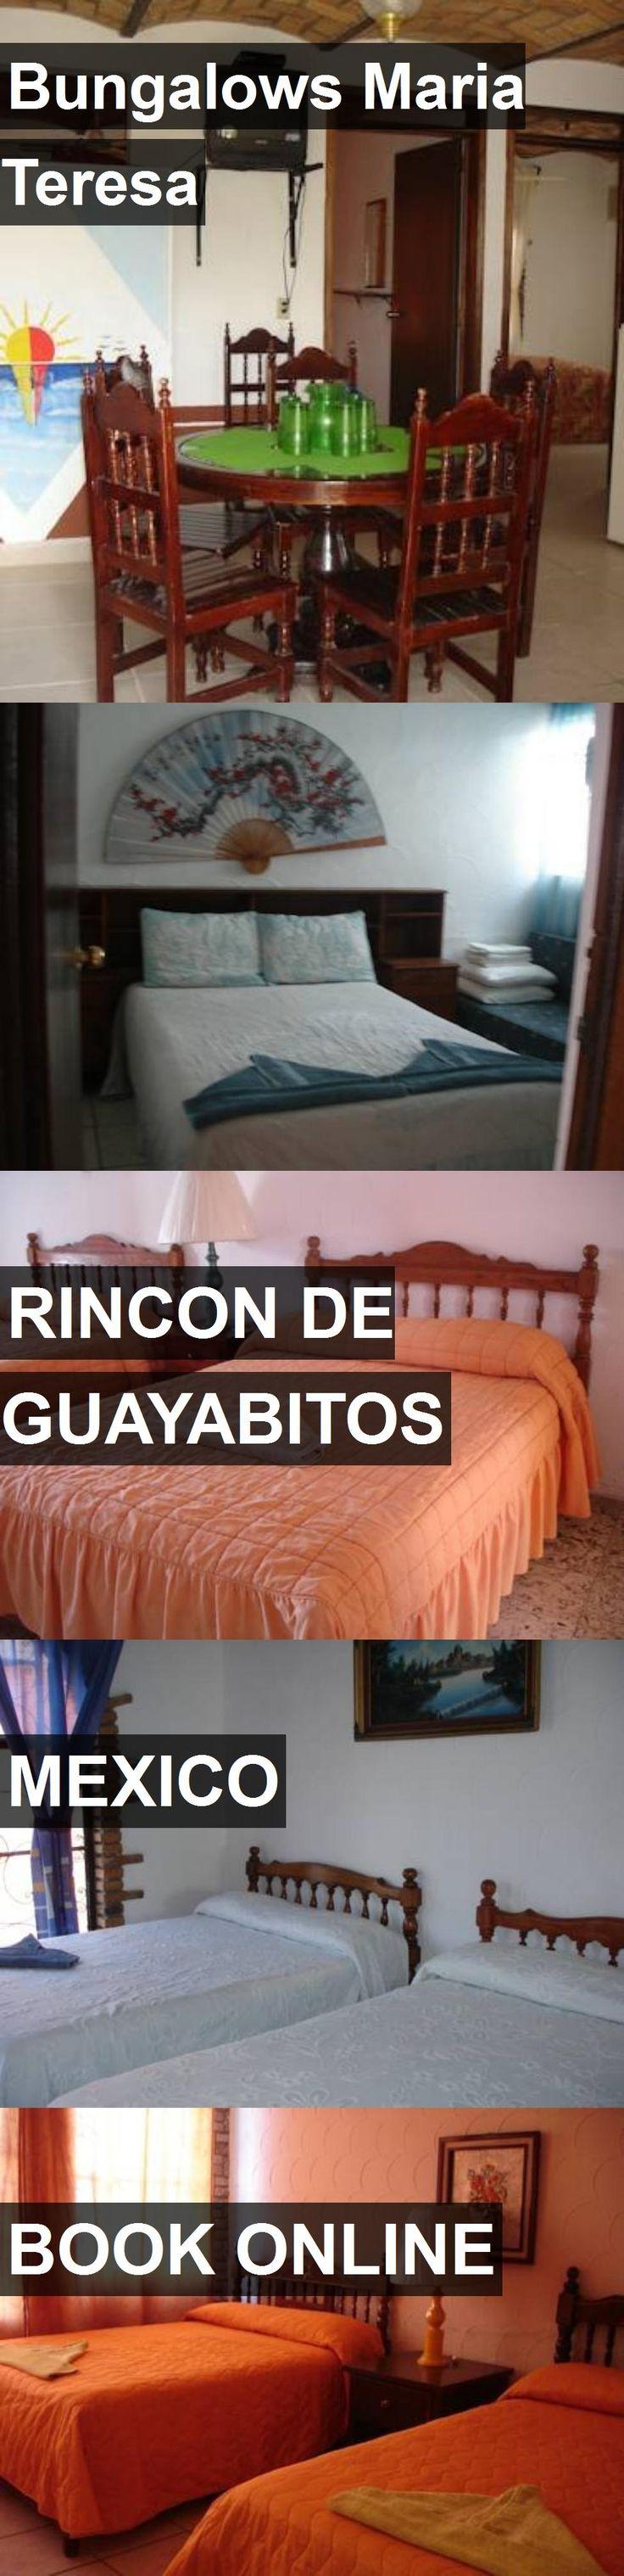 Hotel Bungalows Maria Teresa in Rincon de Guayabitos, Mexico. For more information, photos, reviews and best prices please follow the link. #Mexico #RincondeGuayabitos #travel #vacation #hotel